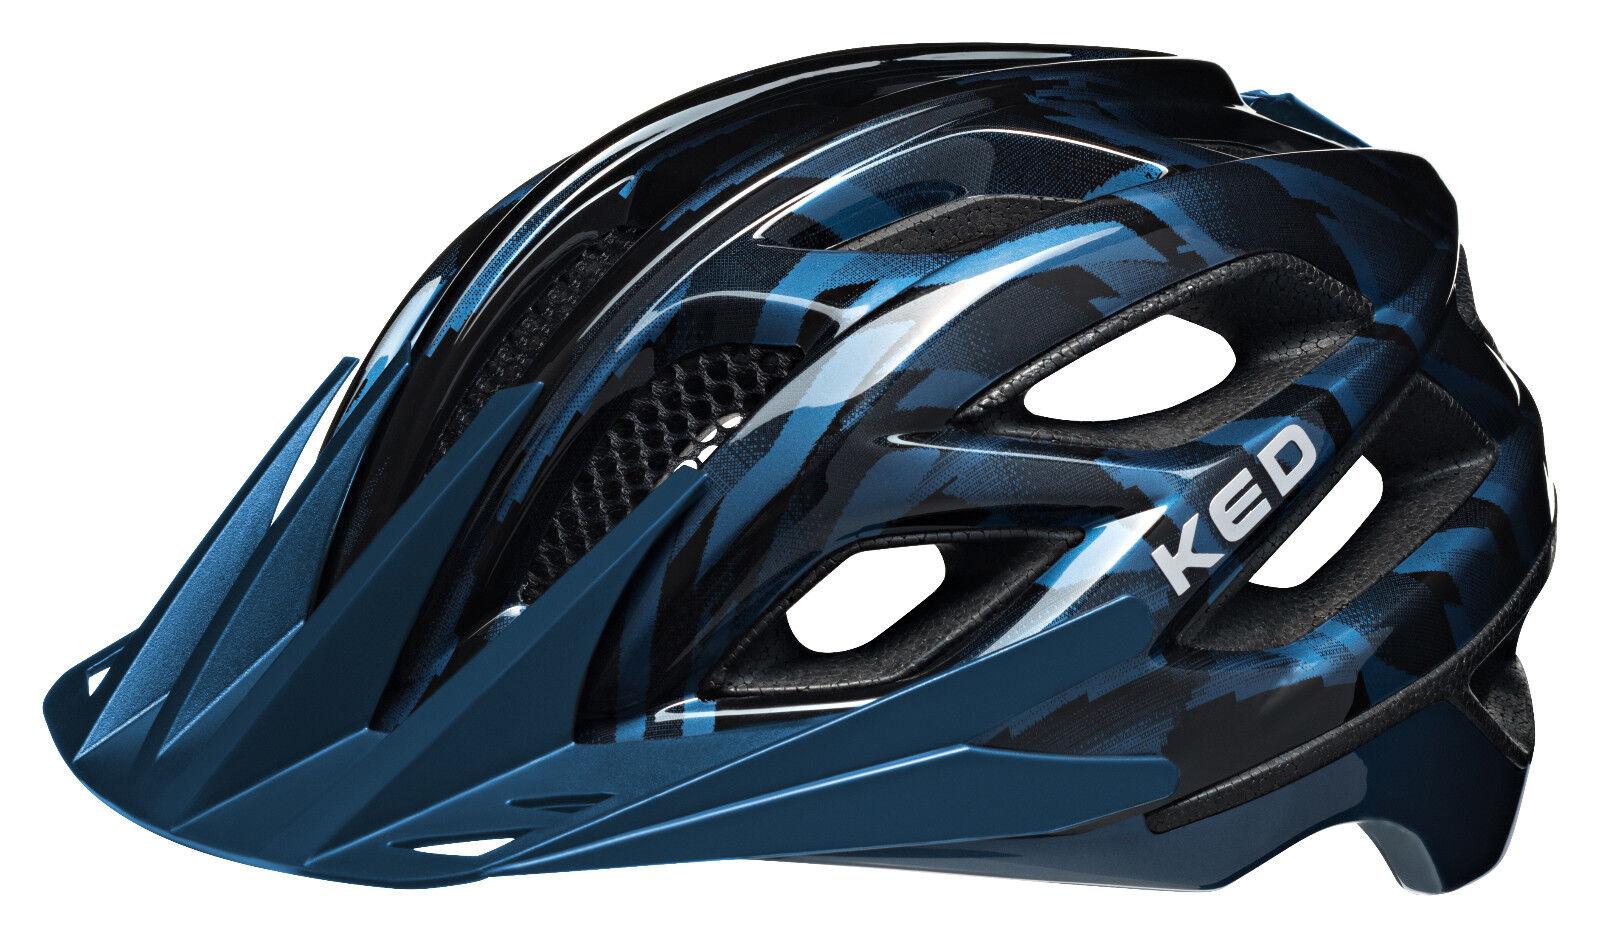 KED Casque Companion schwarz Blau   Größe L 55–61 cm   11103890226 L